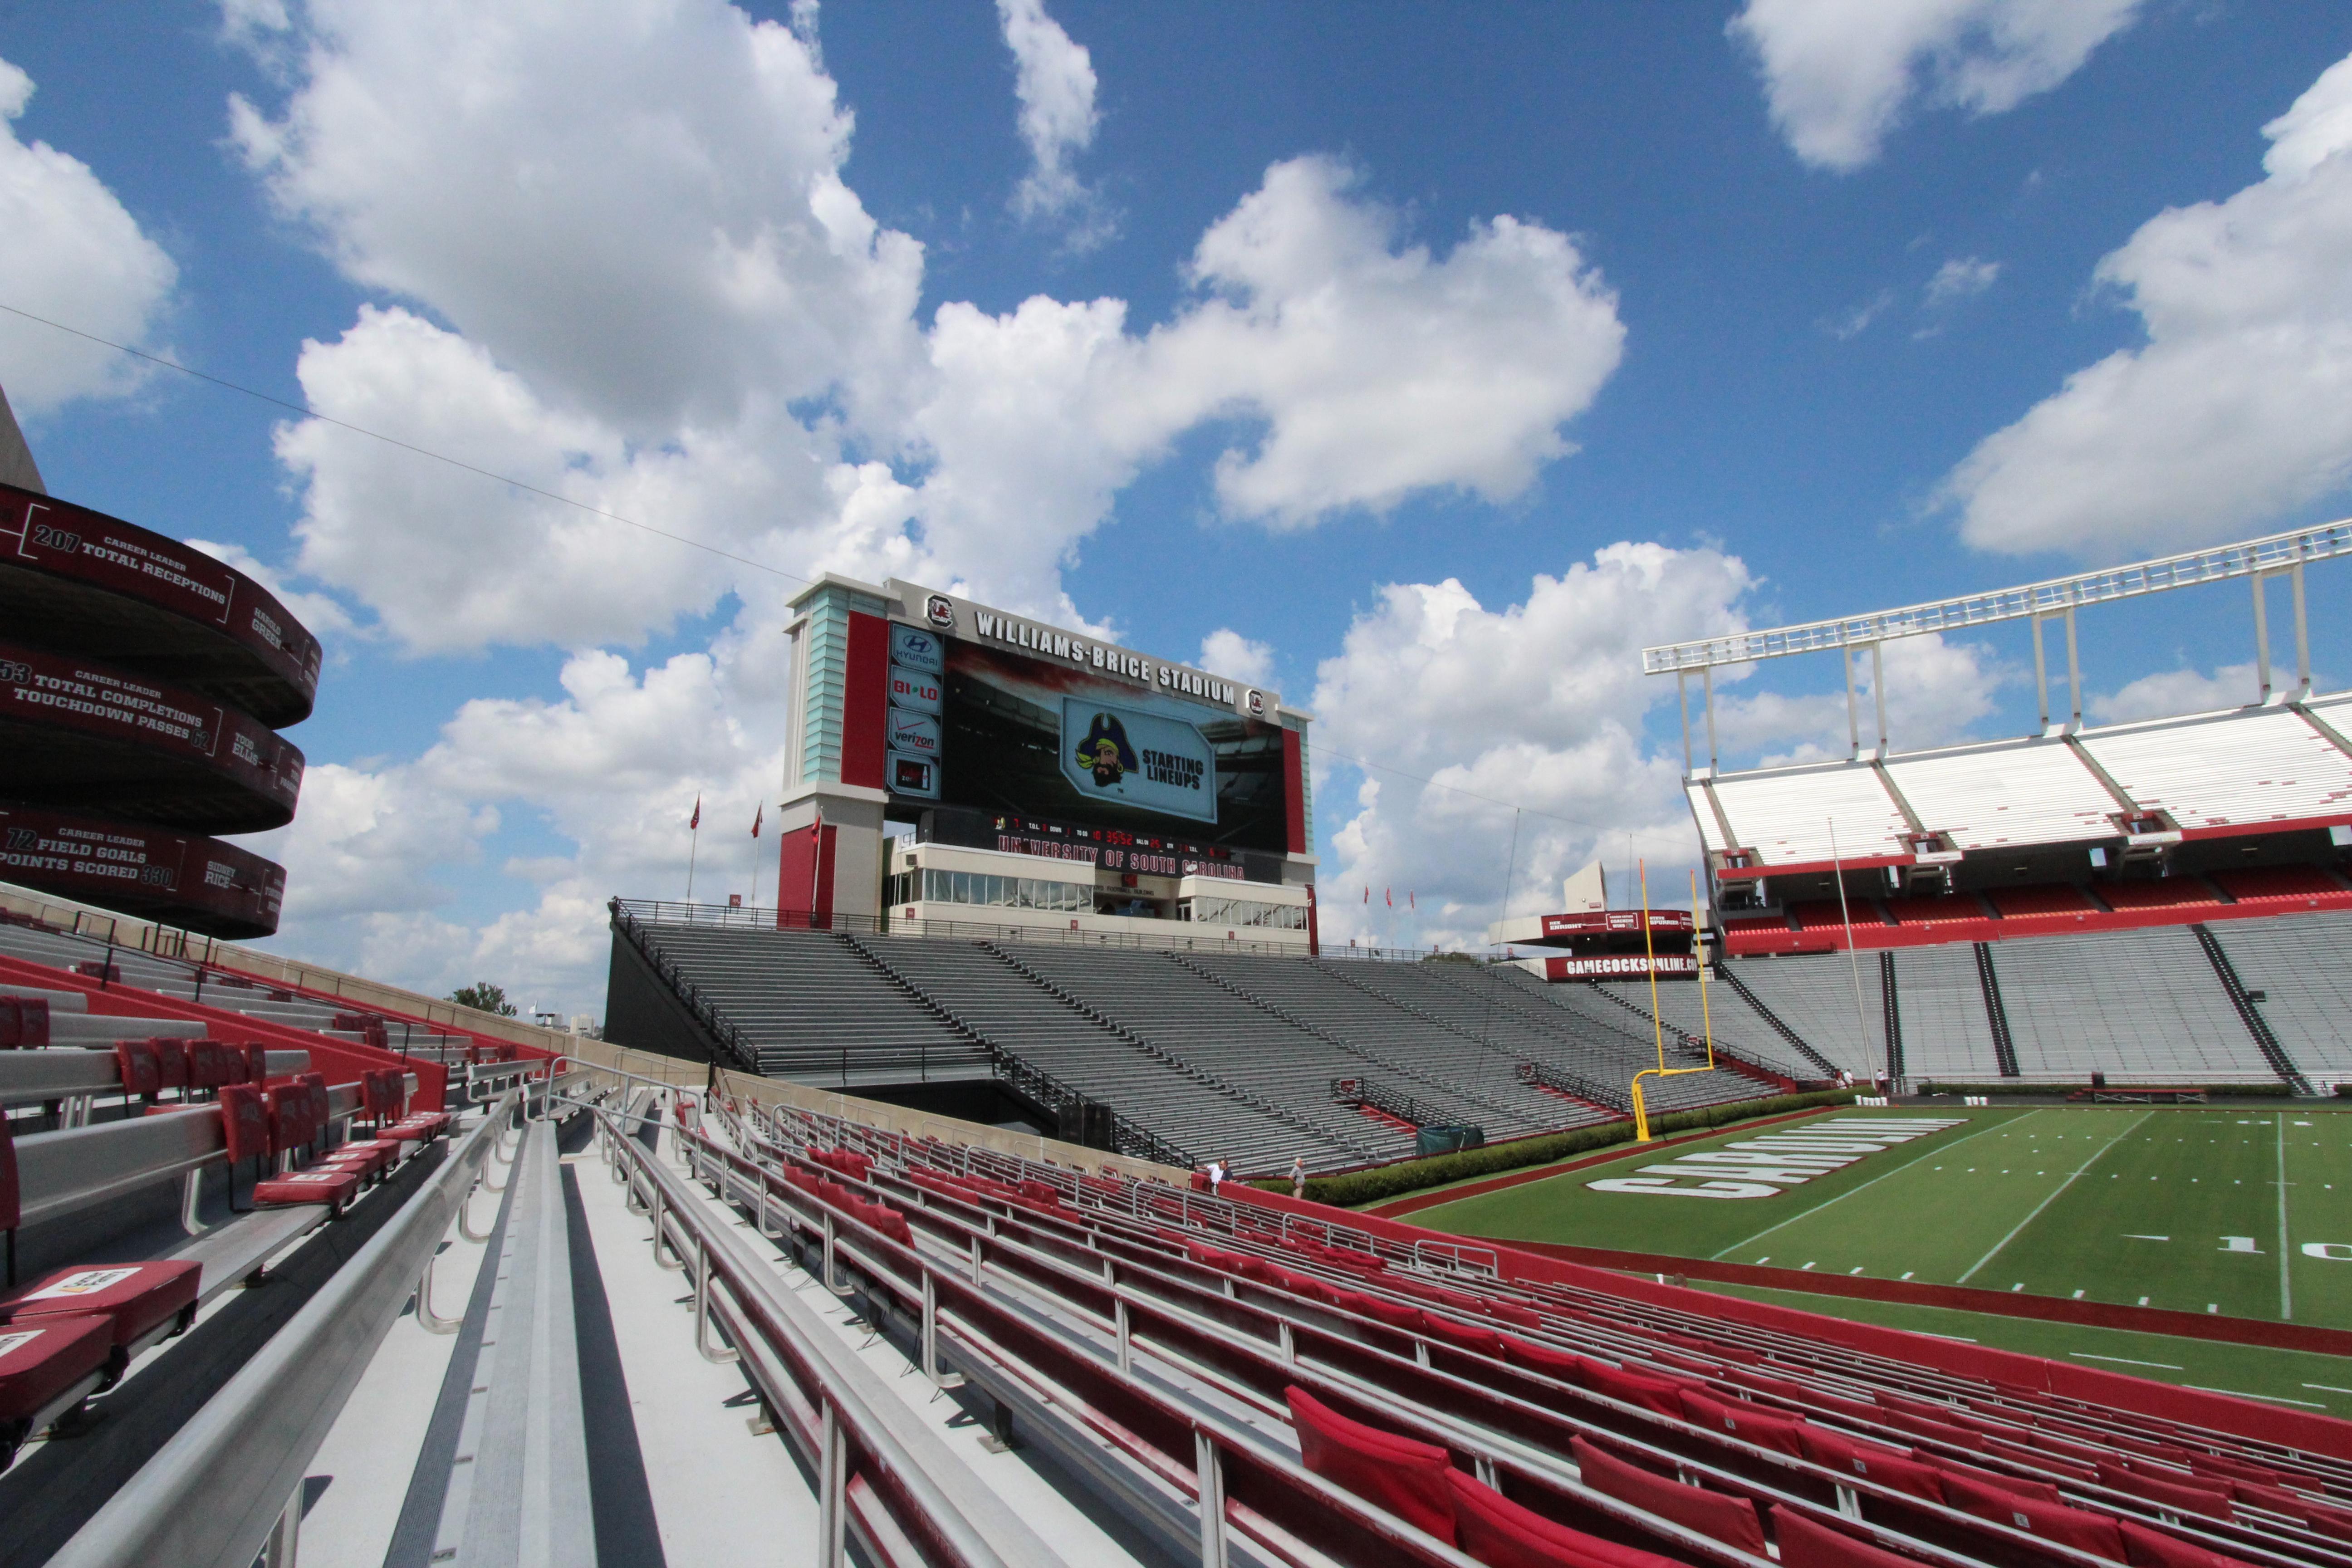 File:Williams-Brice Stadium at University of South ...